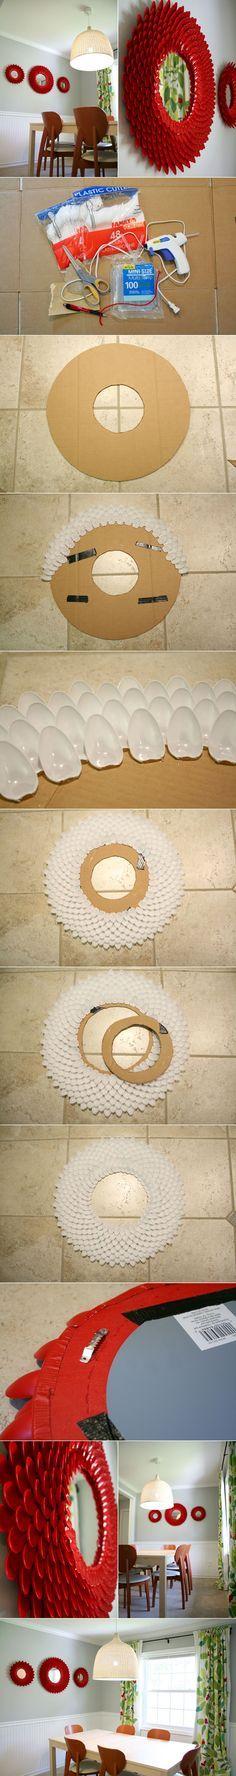 DIY Decorative Chrysanthemum Mirror with Plastic Spoons | www.FabArtDIY.com LIKE Us on Facebook ==> https://www.facebook.com/FabArtDIY